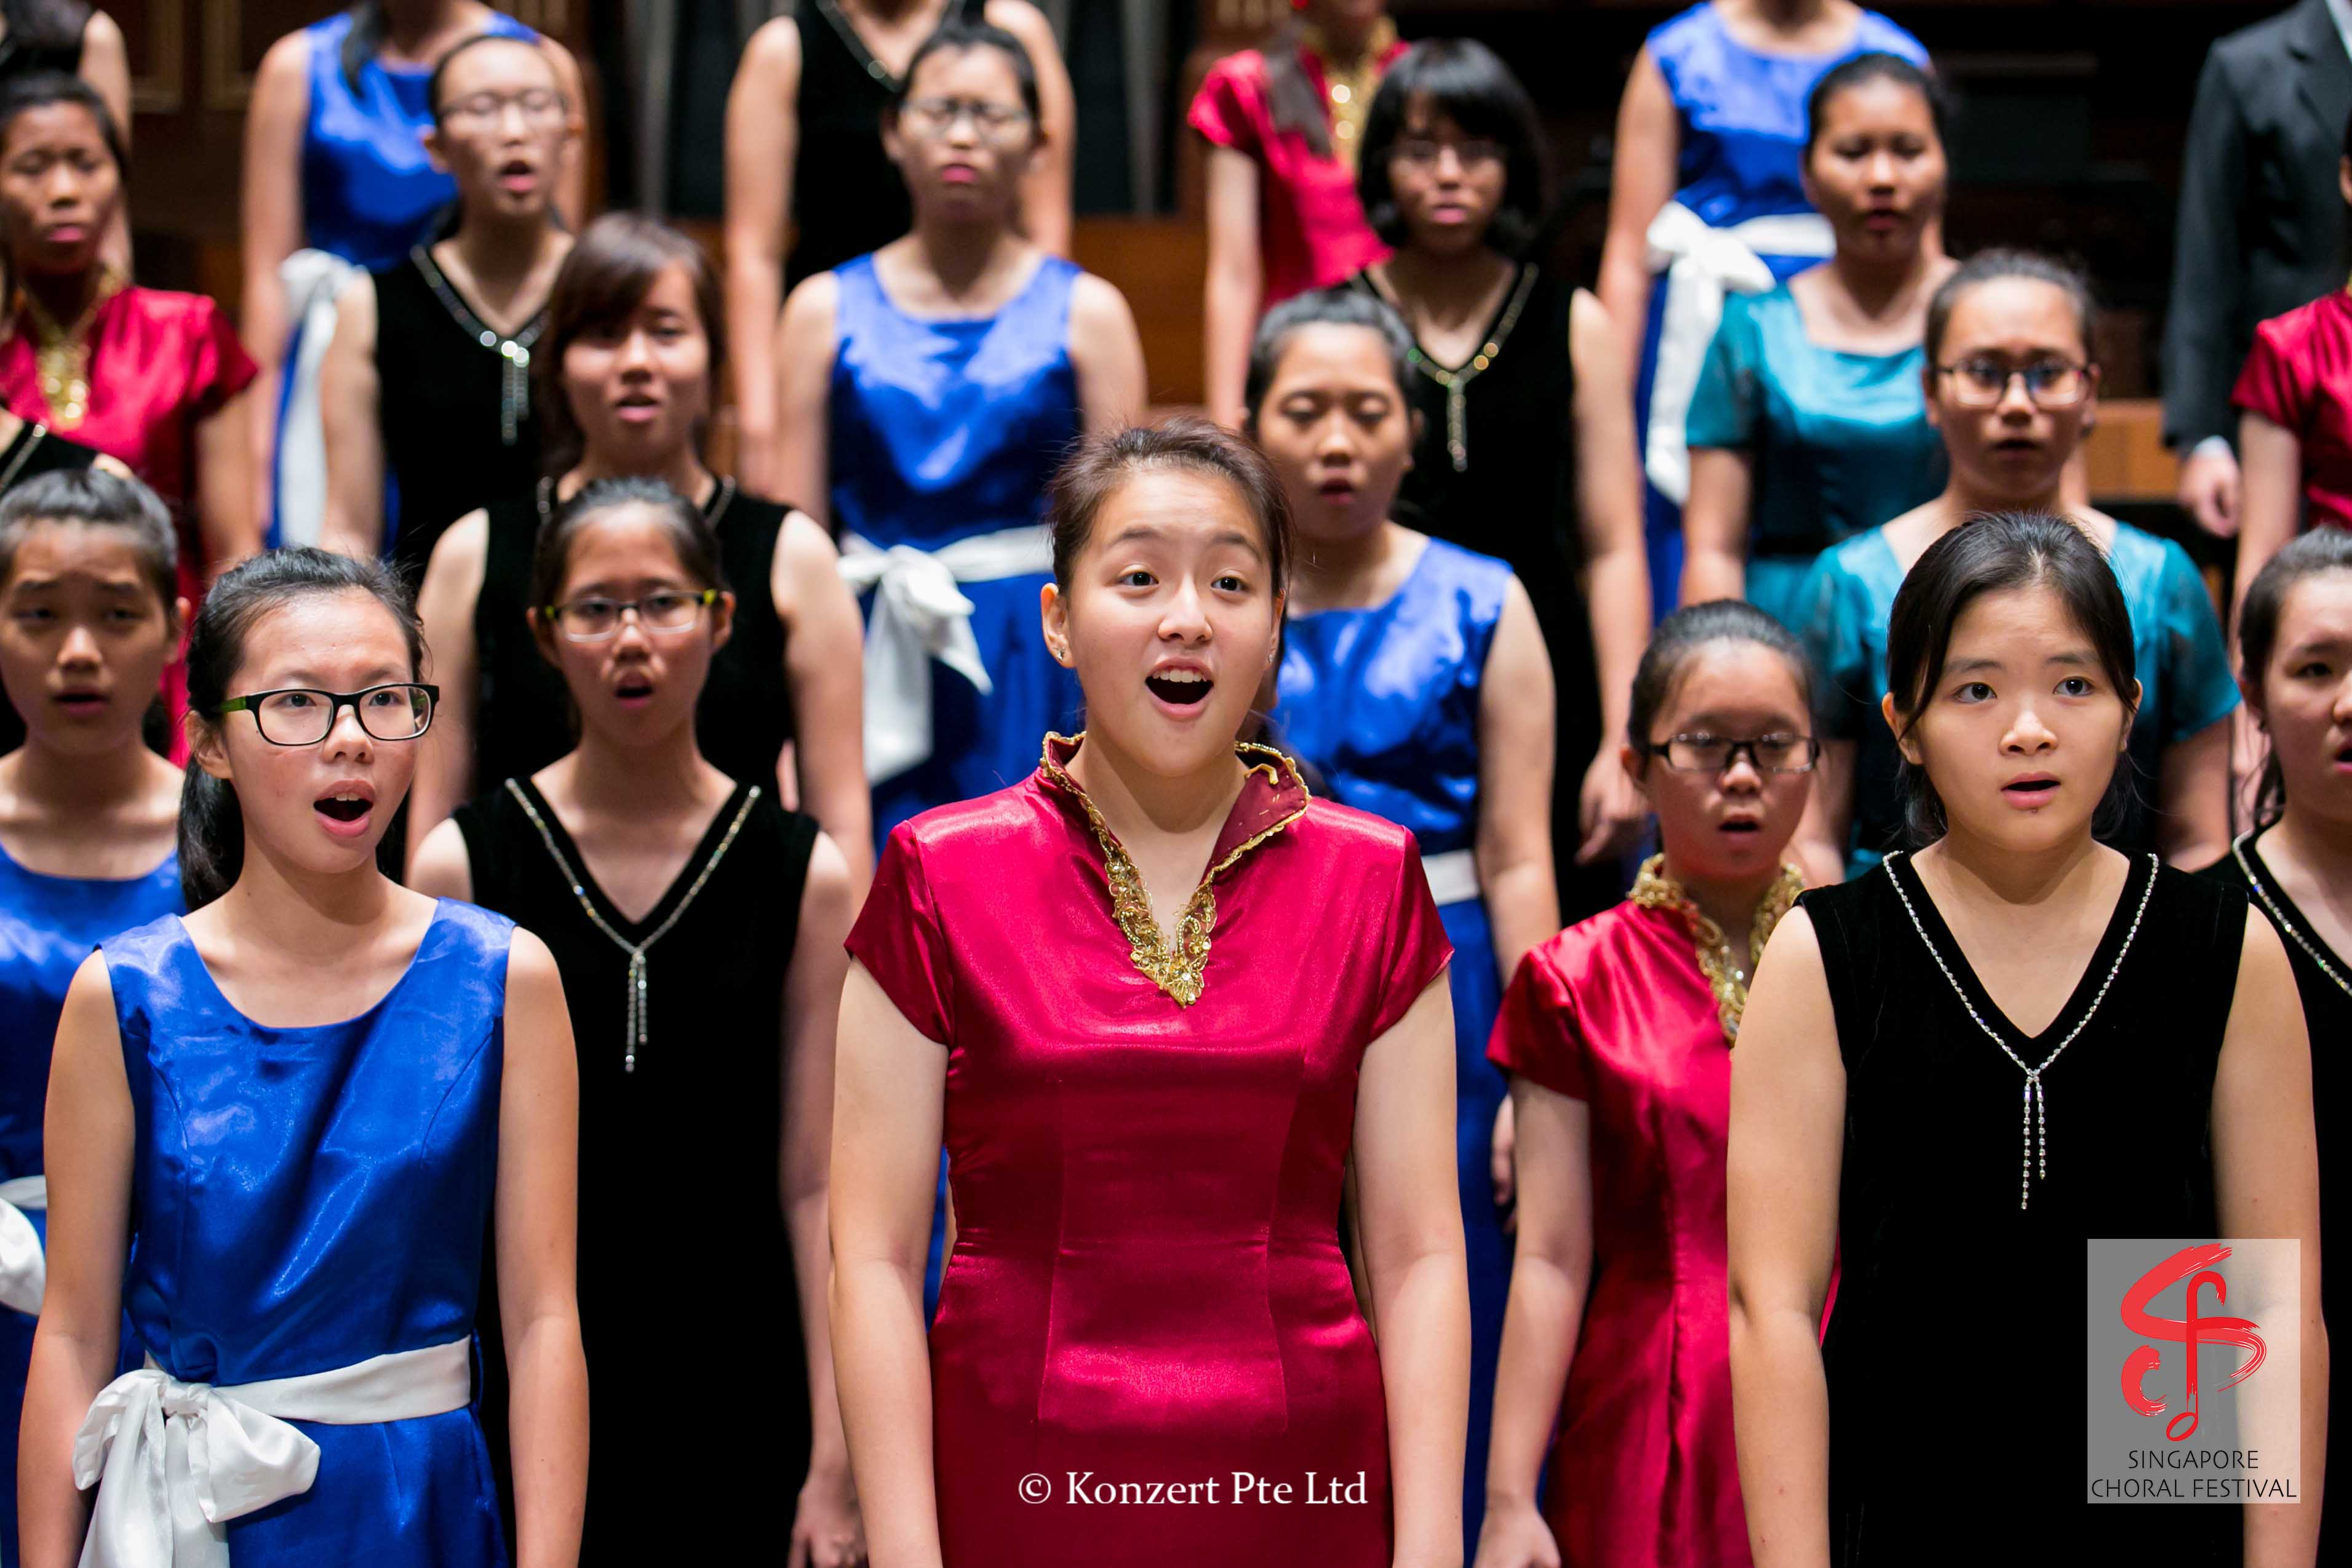 Singapore Choral Festival 7-8-15 (129).jpg